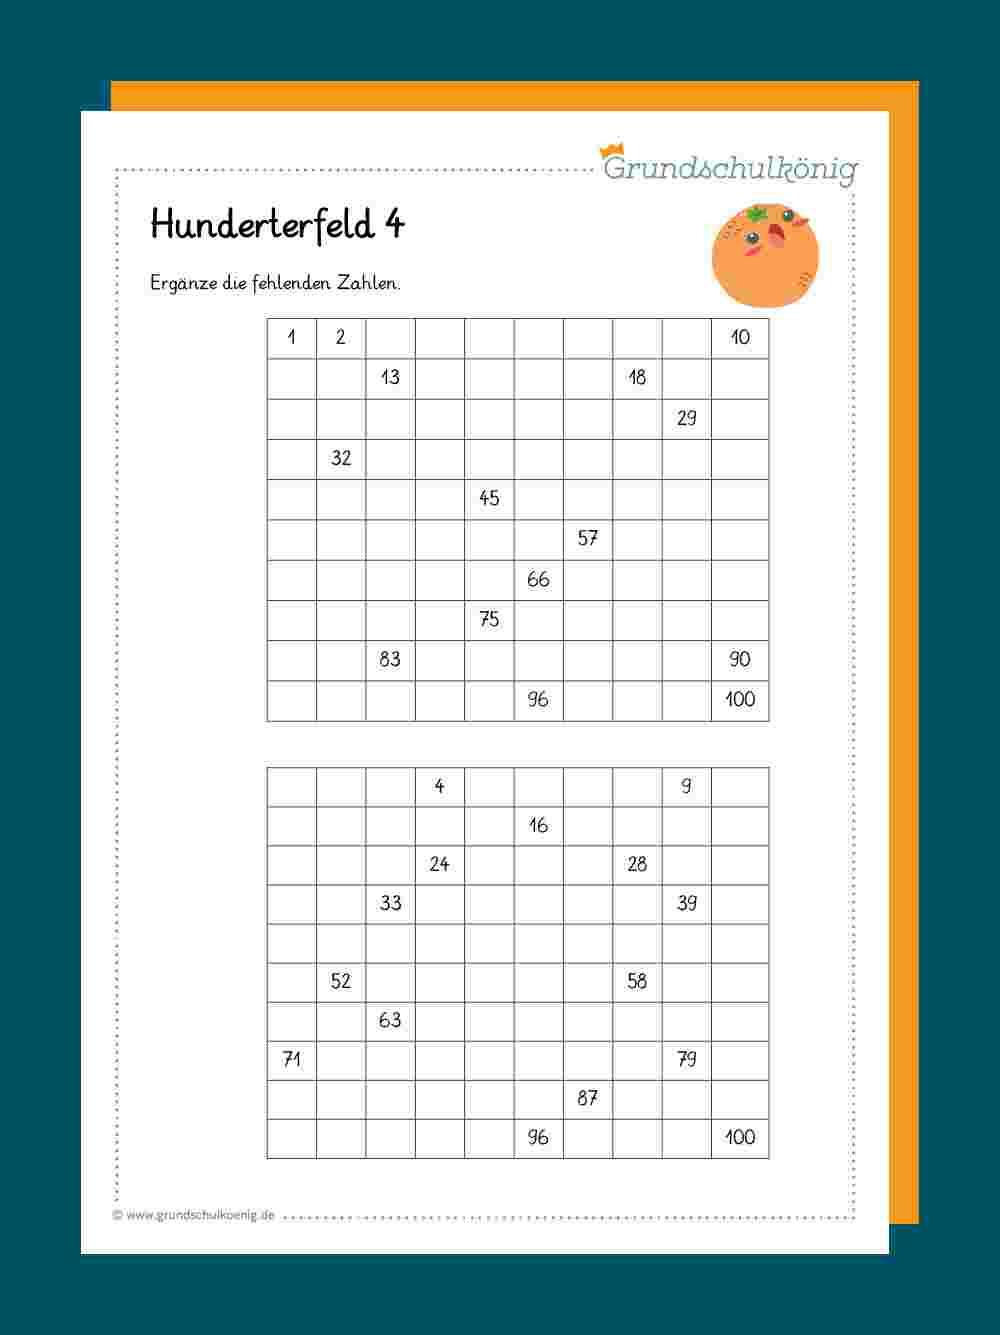 Hundertertafel / Hunderterfeld verwandt mit Zaubermini